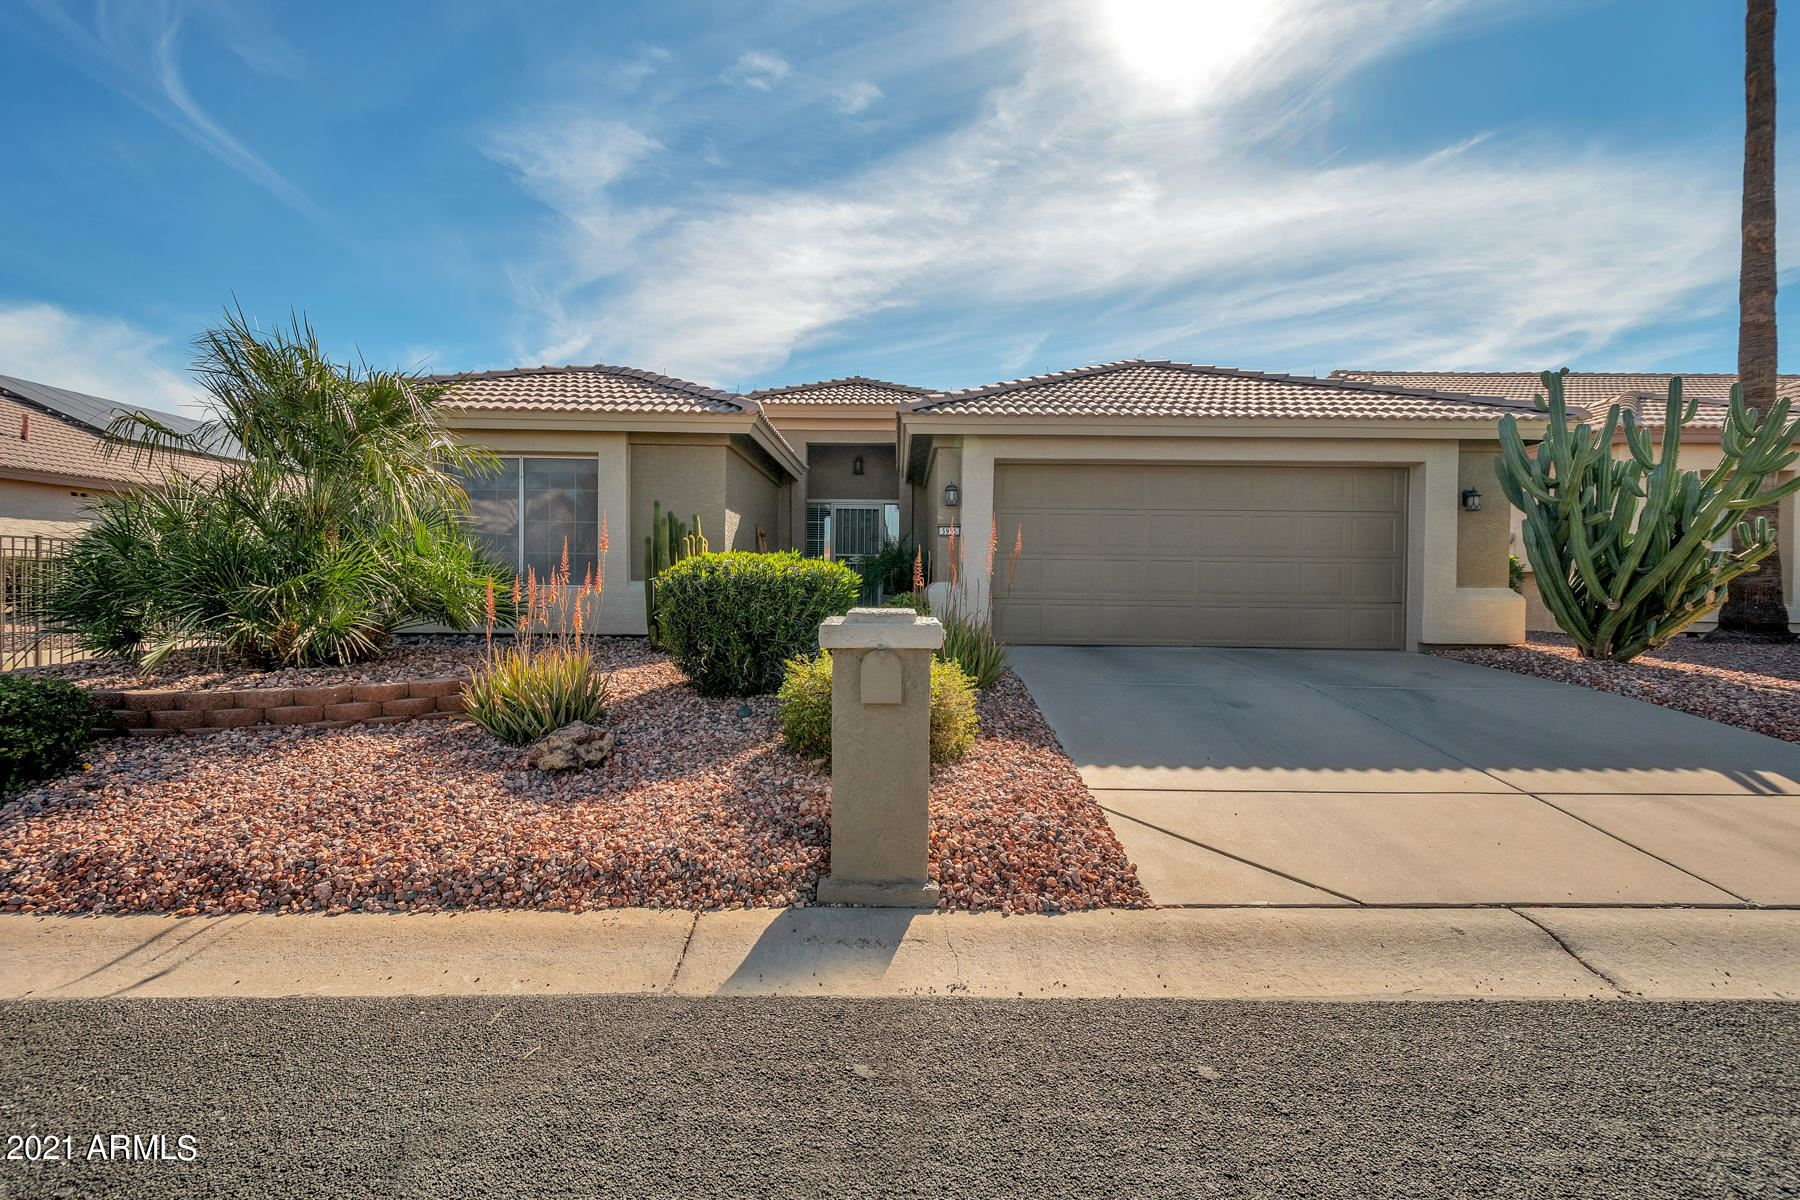 Photo of 3955 N 150TH Lane, Goodyear, AZ 85395 (MLS # 6199245)